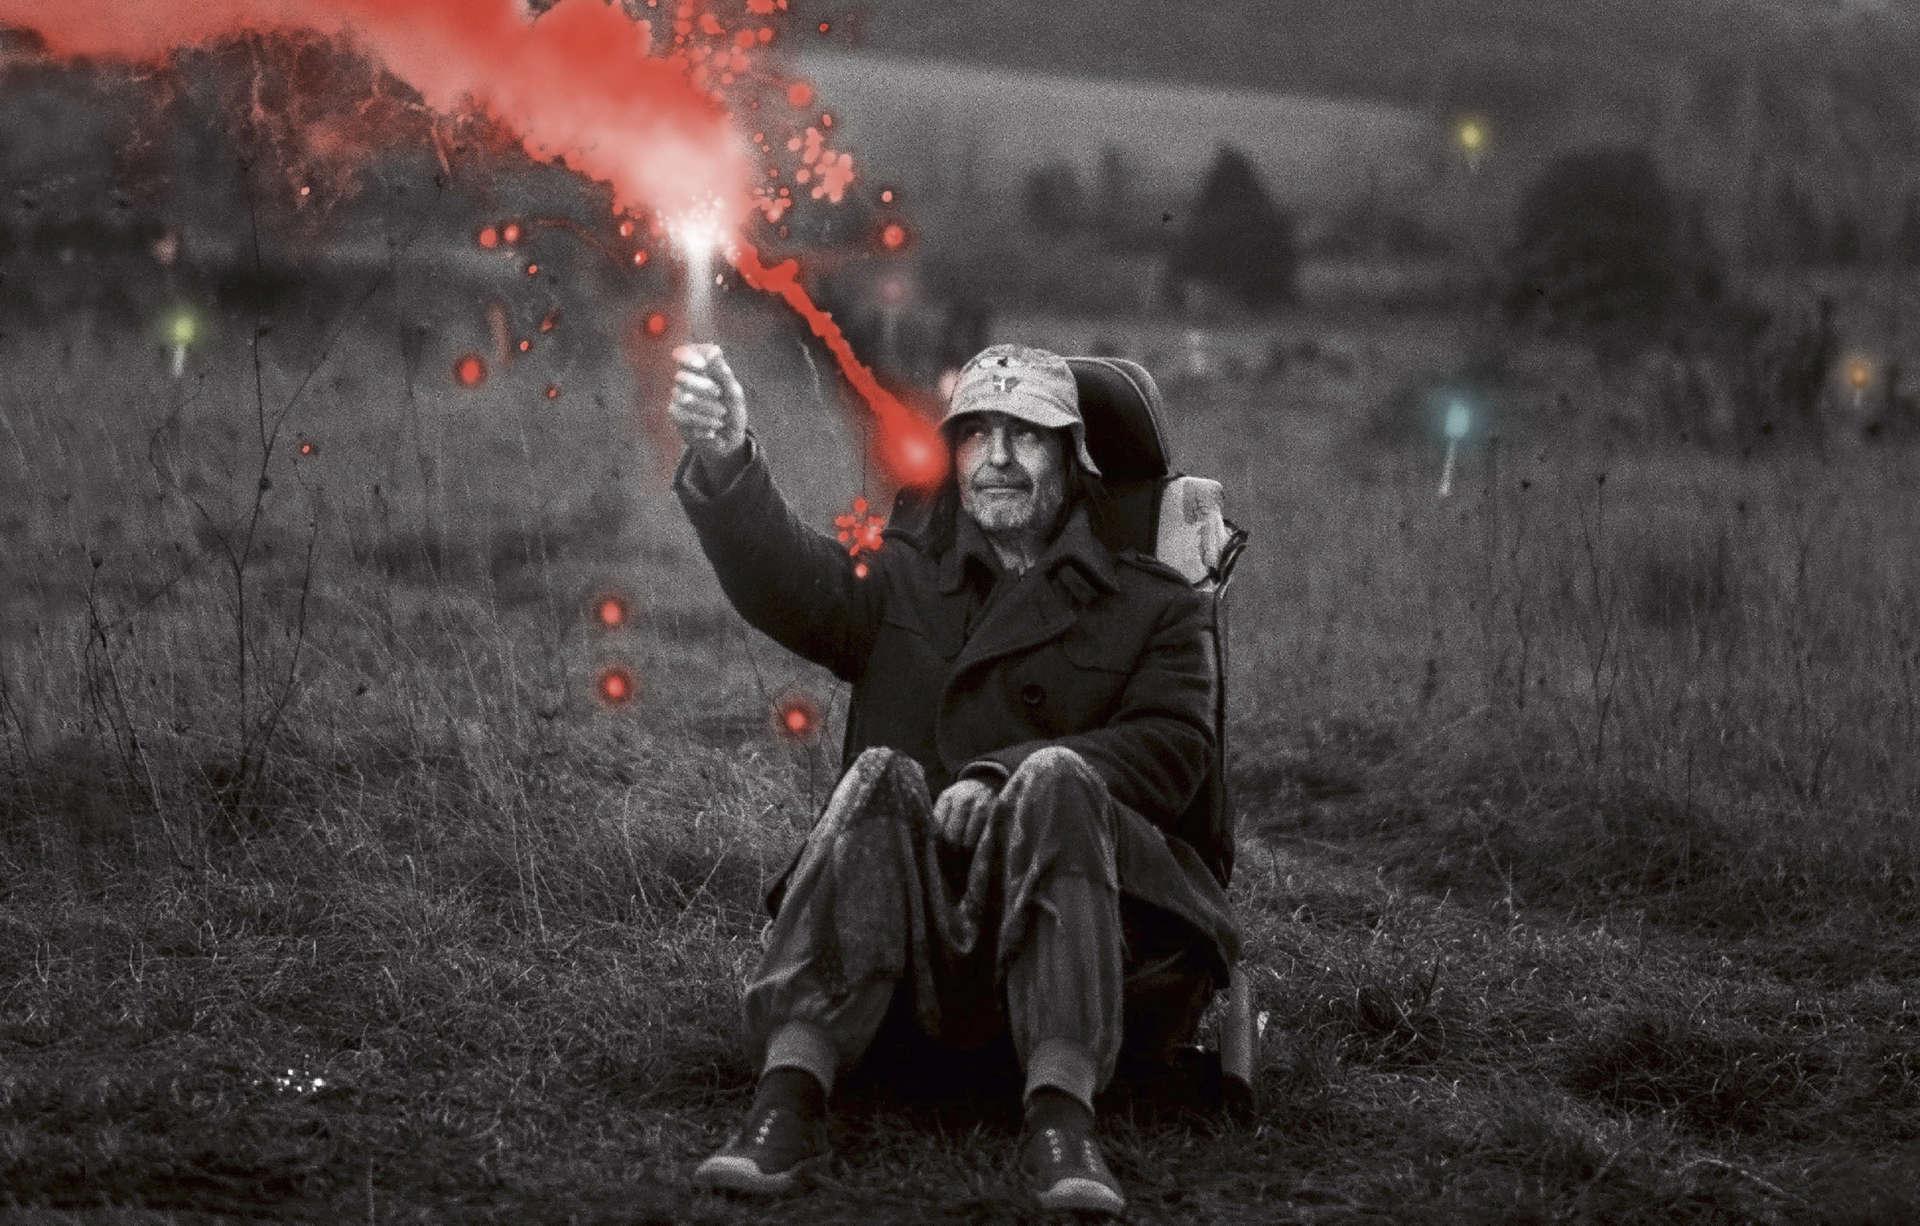 A man lights a sparkler in the film Bugarach